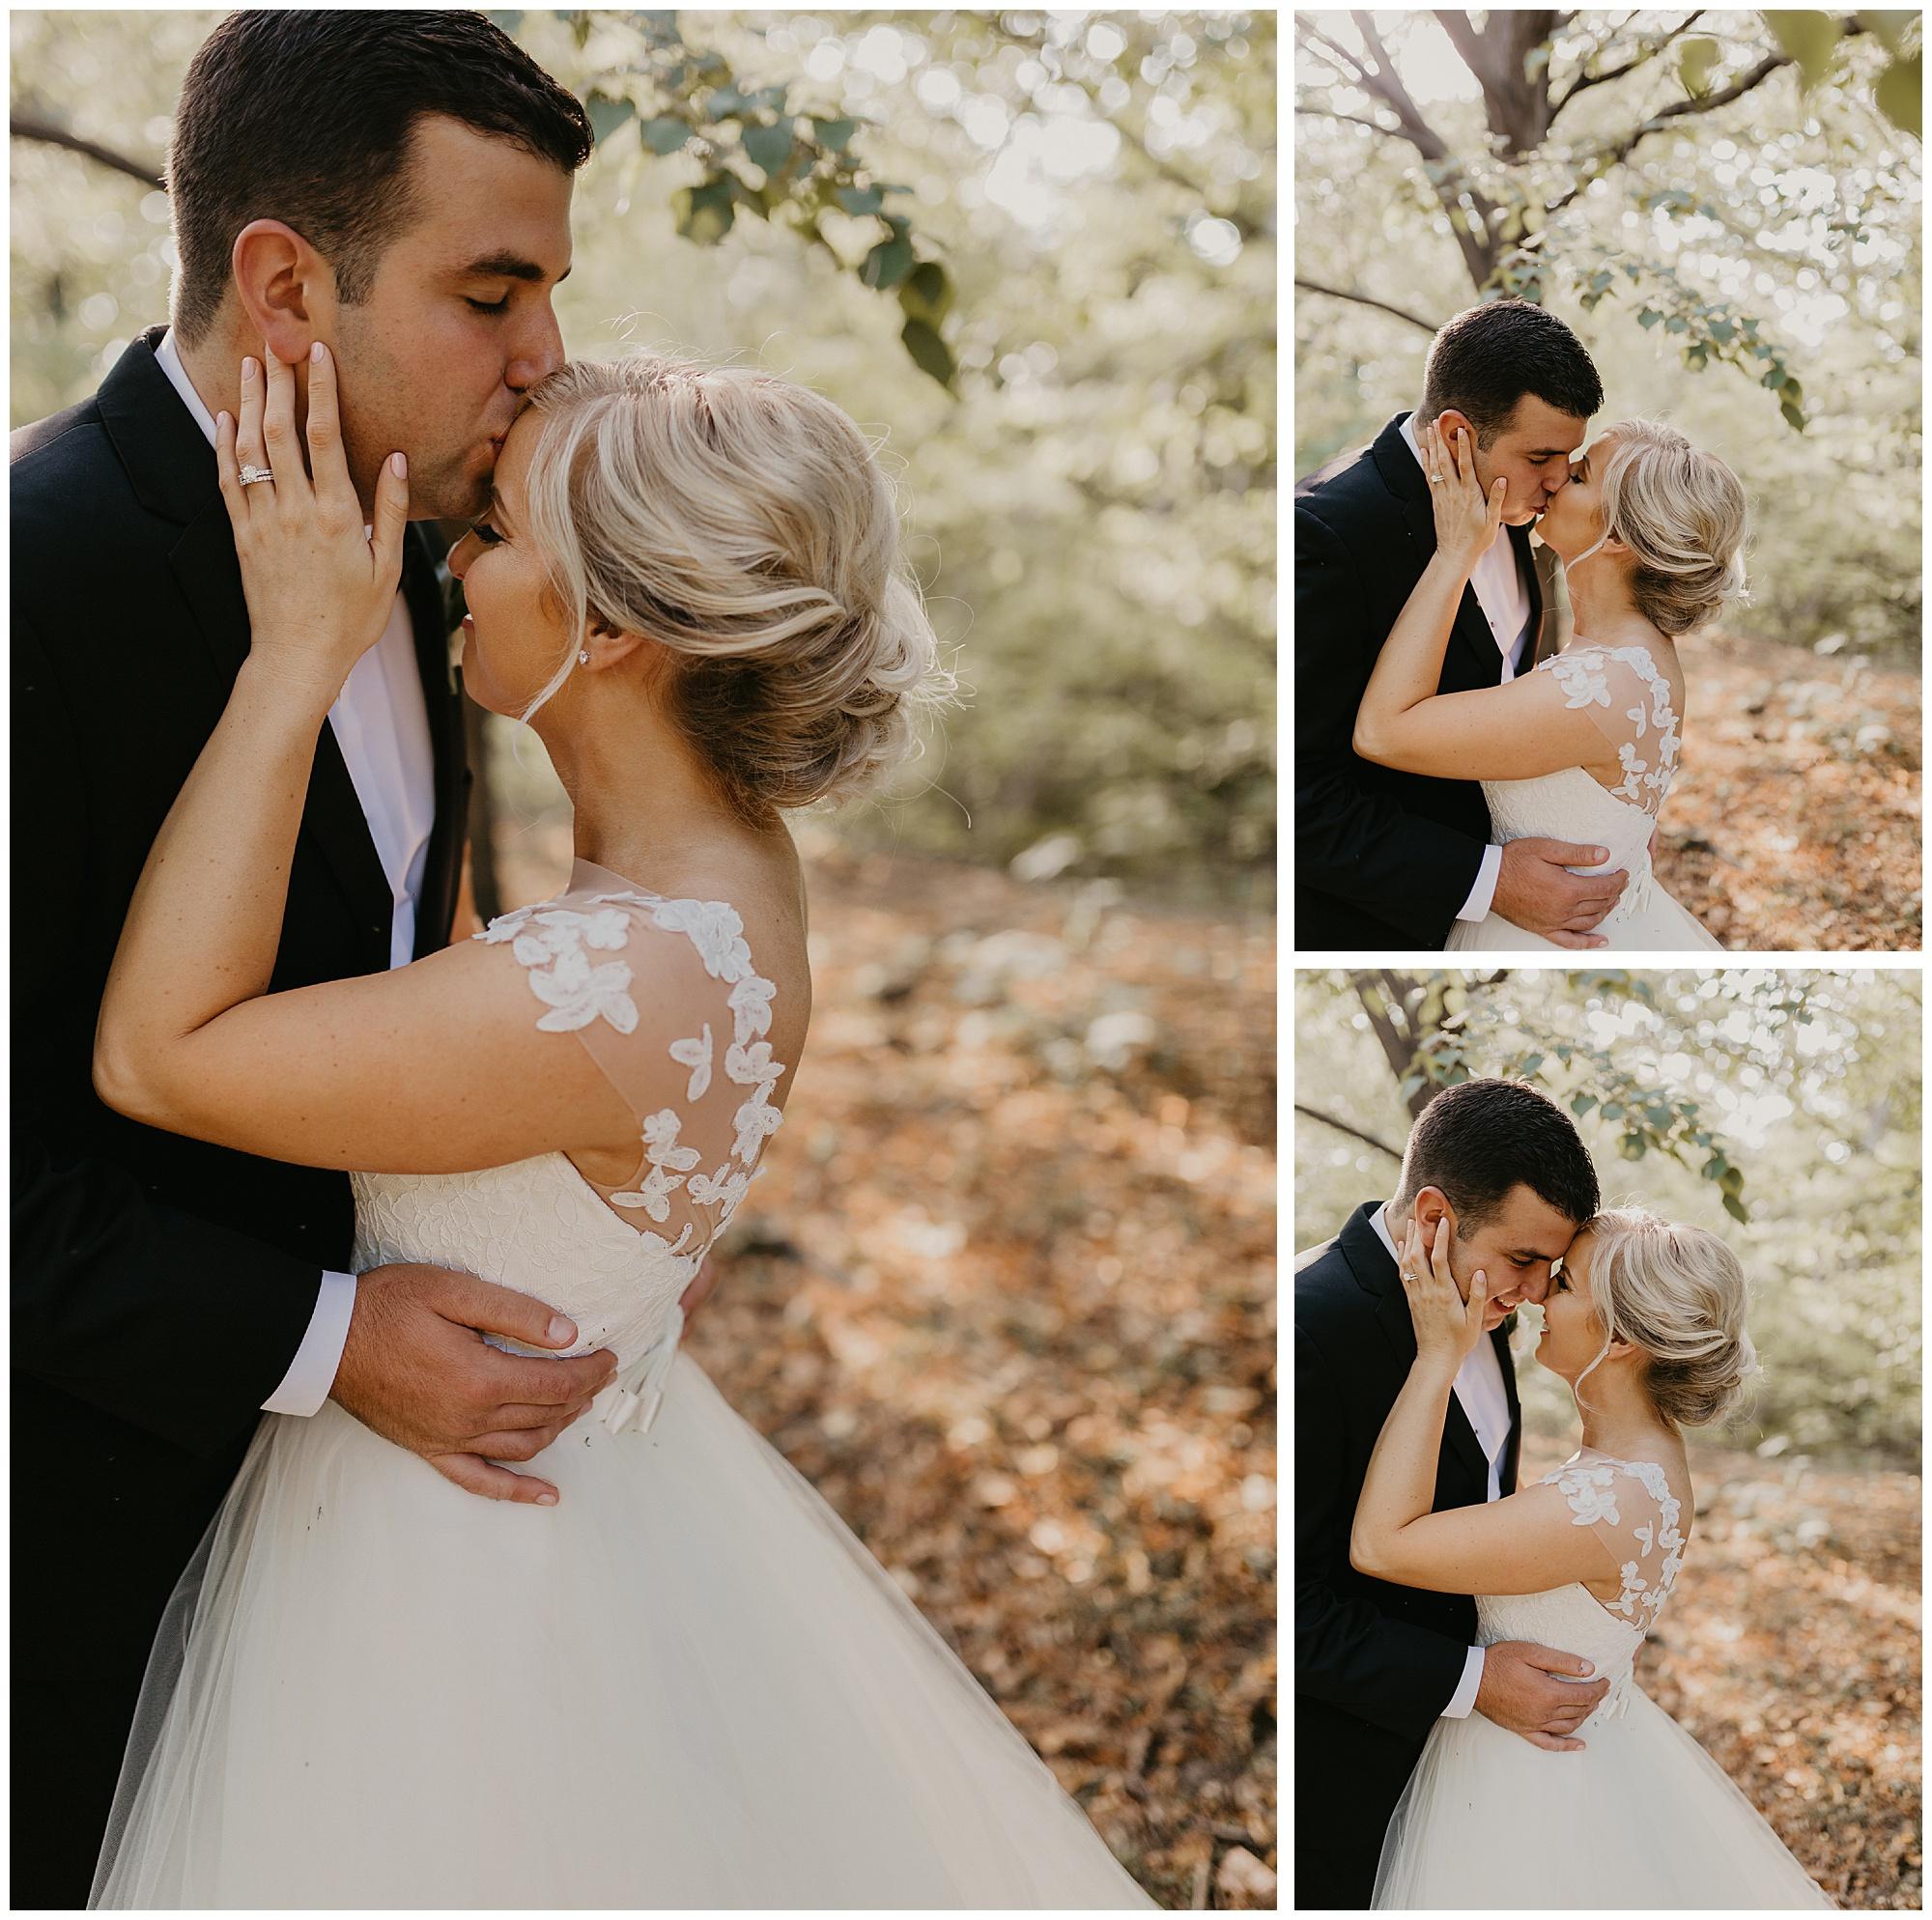 pear_tree_estate_wedding_champaign_il_wright_photographs_jj_0015.jpg